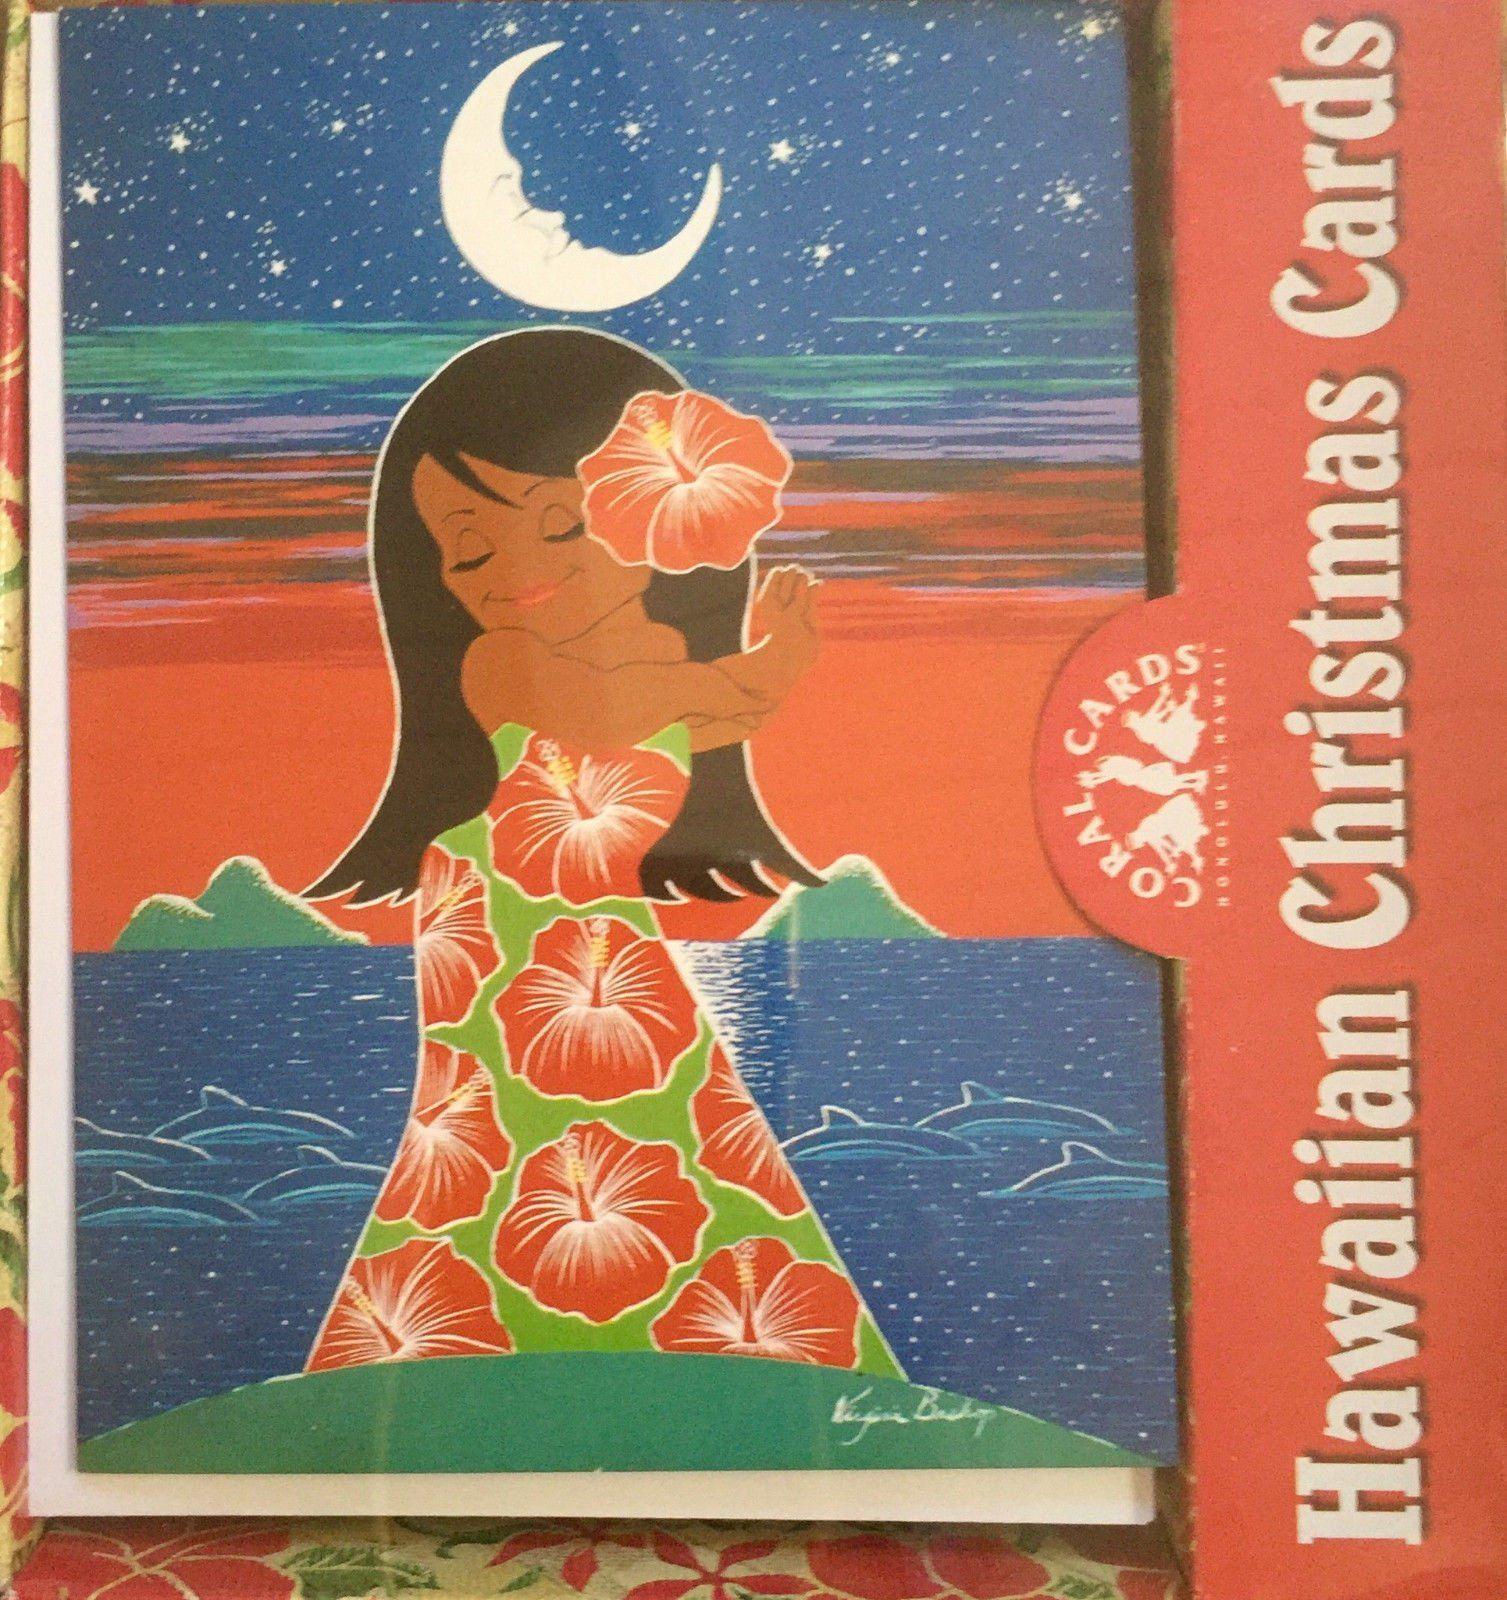 Hawaii Hula Girl Christmas Card | www.topsimages.com